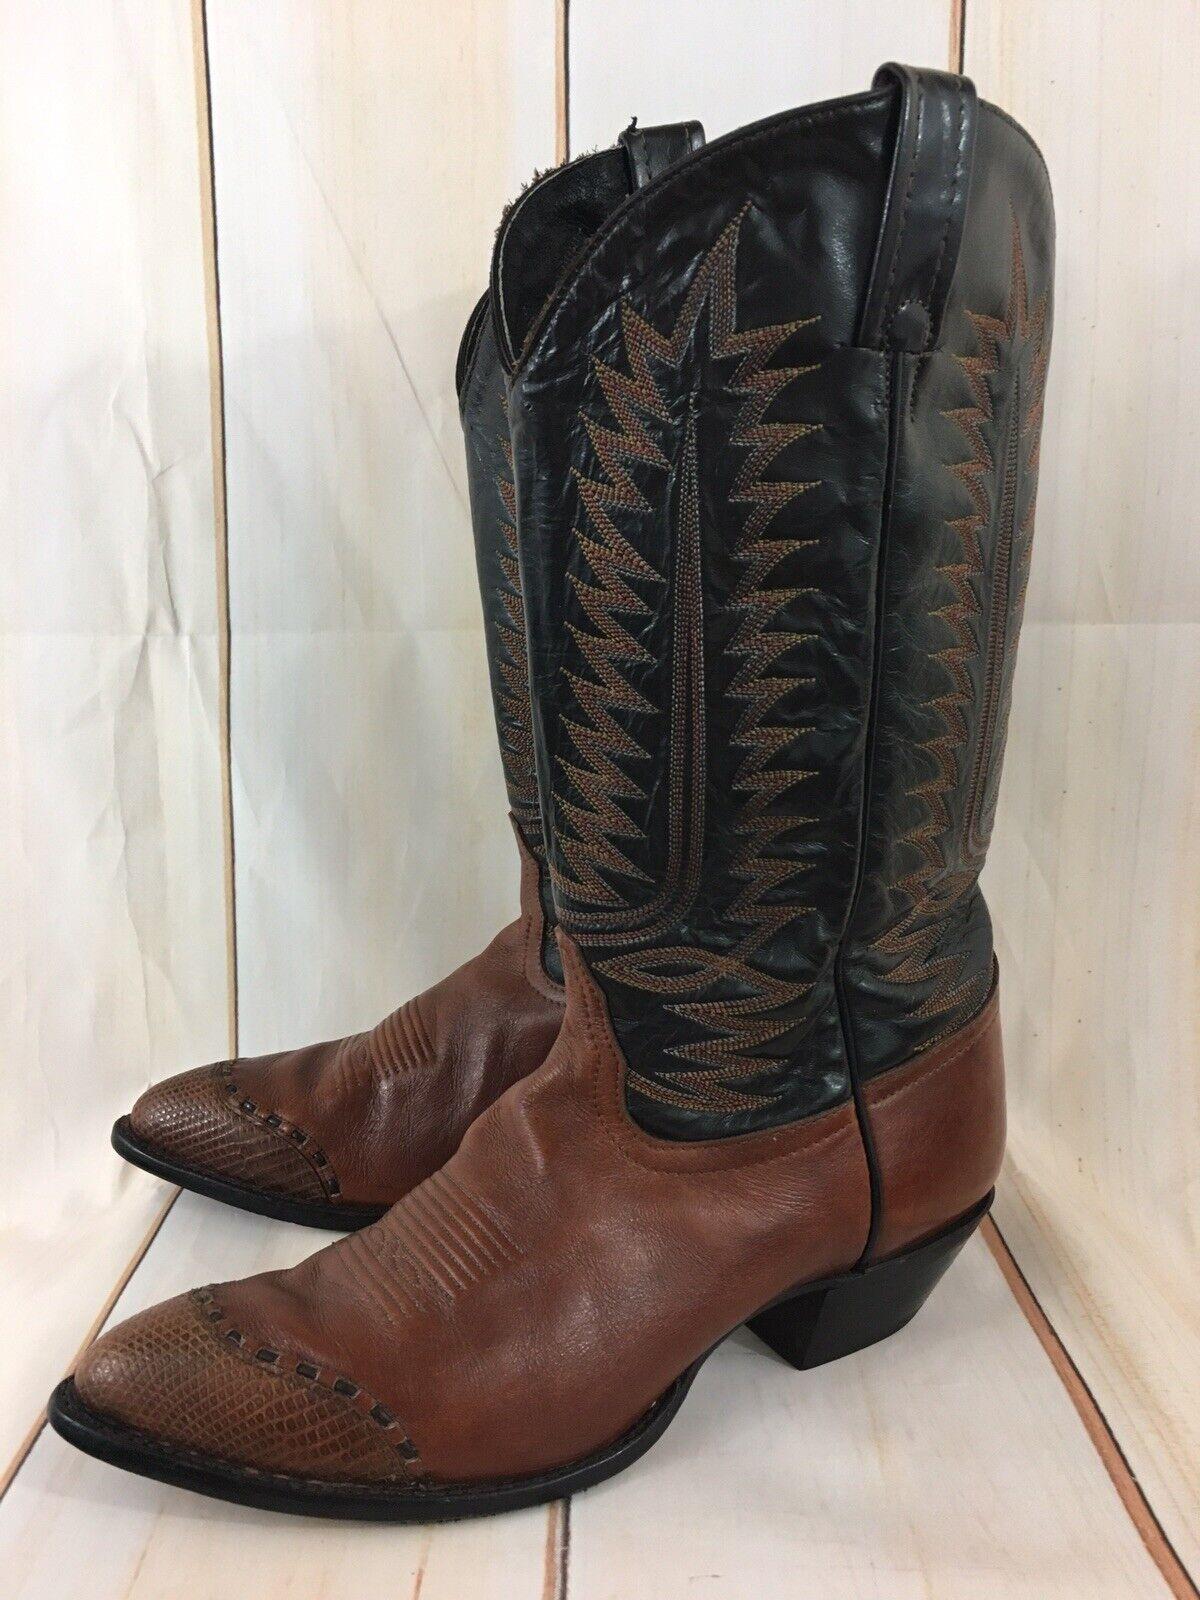 Vintage Tony Lama Leather  Western Cowboy stivali donna 65533s  buon prezzo